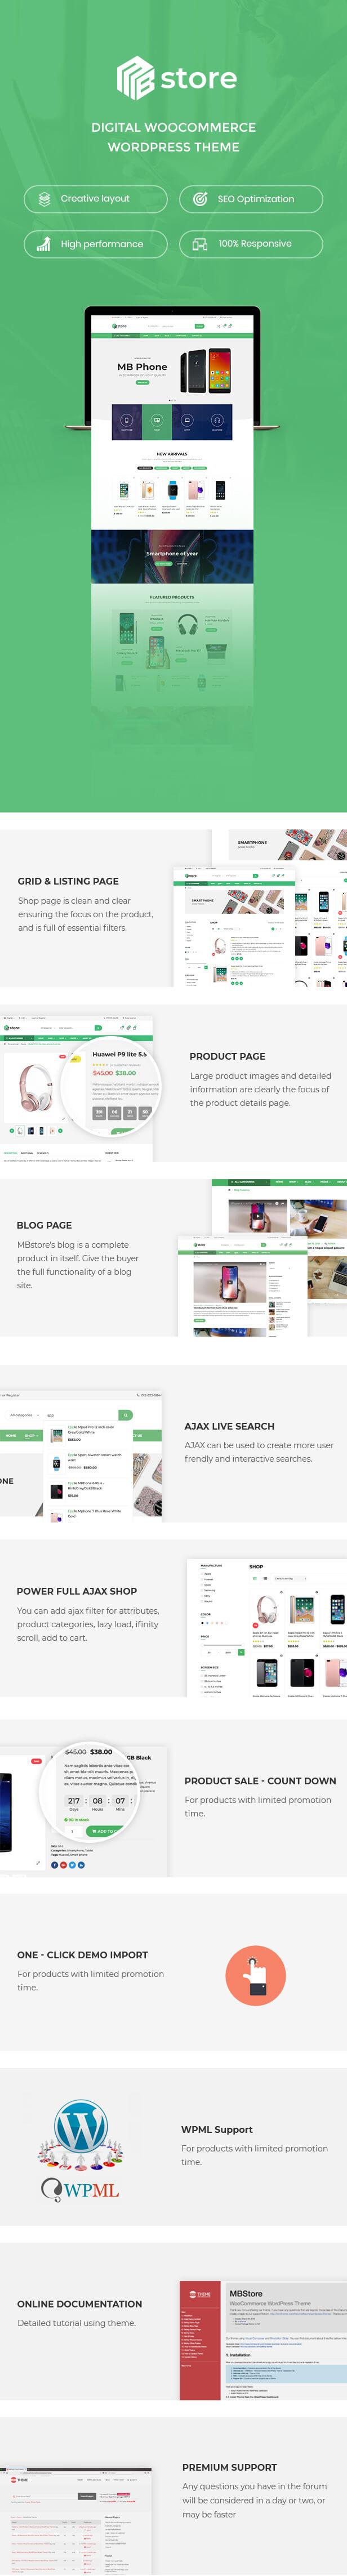 MBStore - Digital WooCommerce WordPress Theme - 1